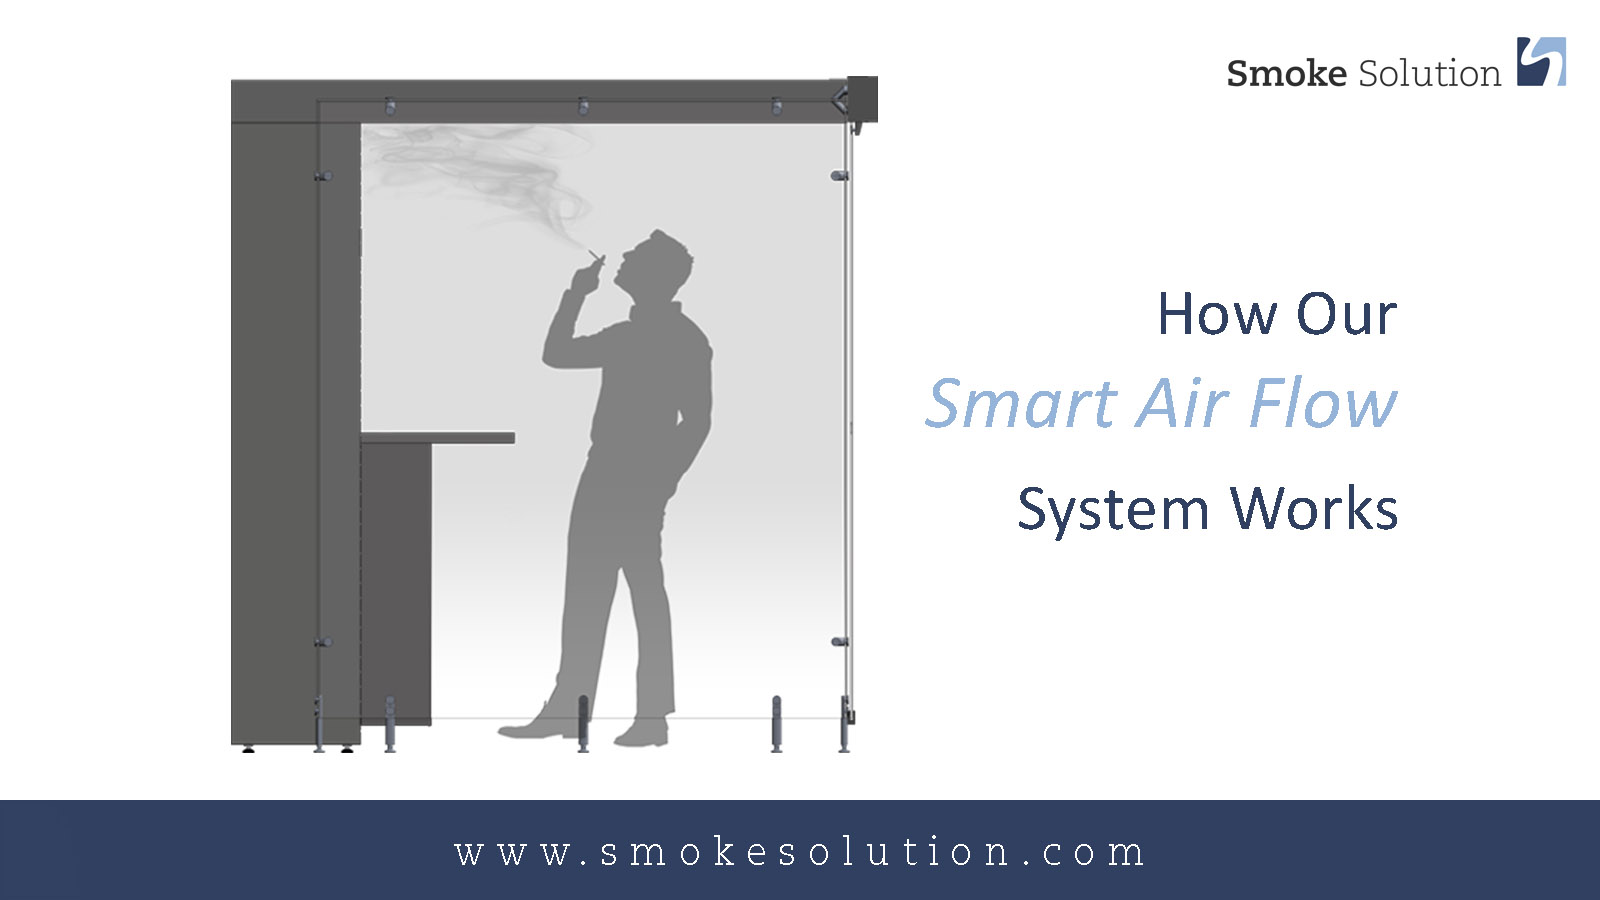 How Smoke Cabin Works